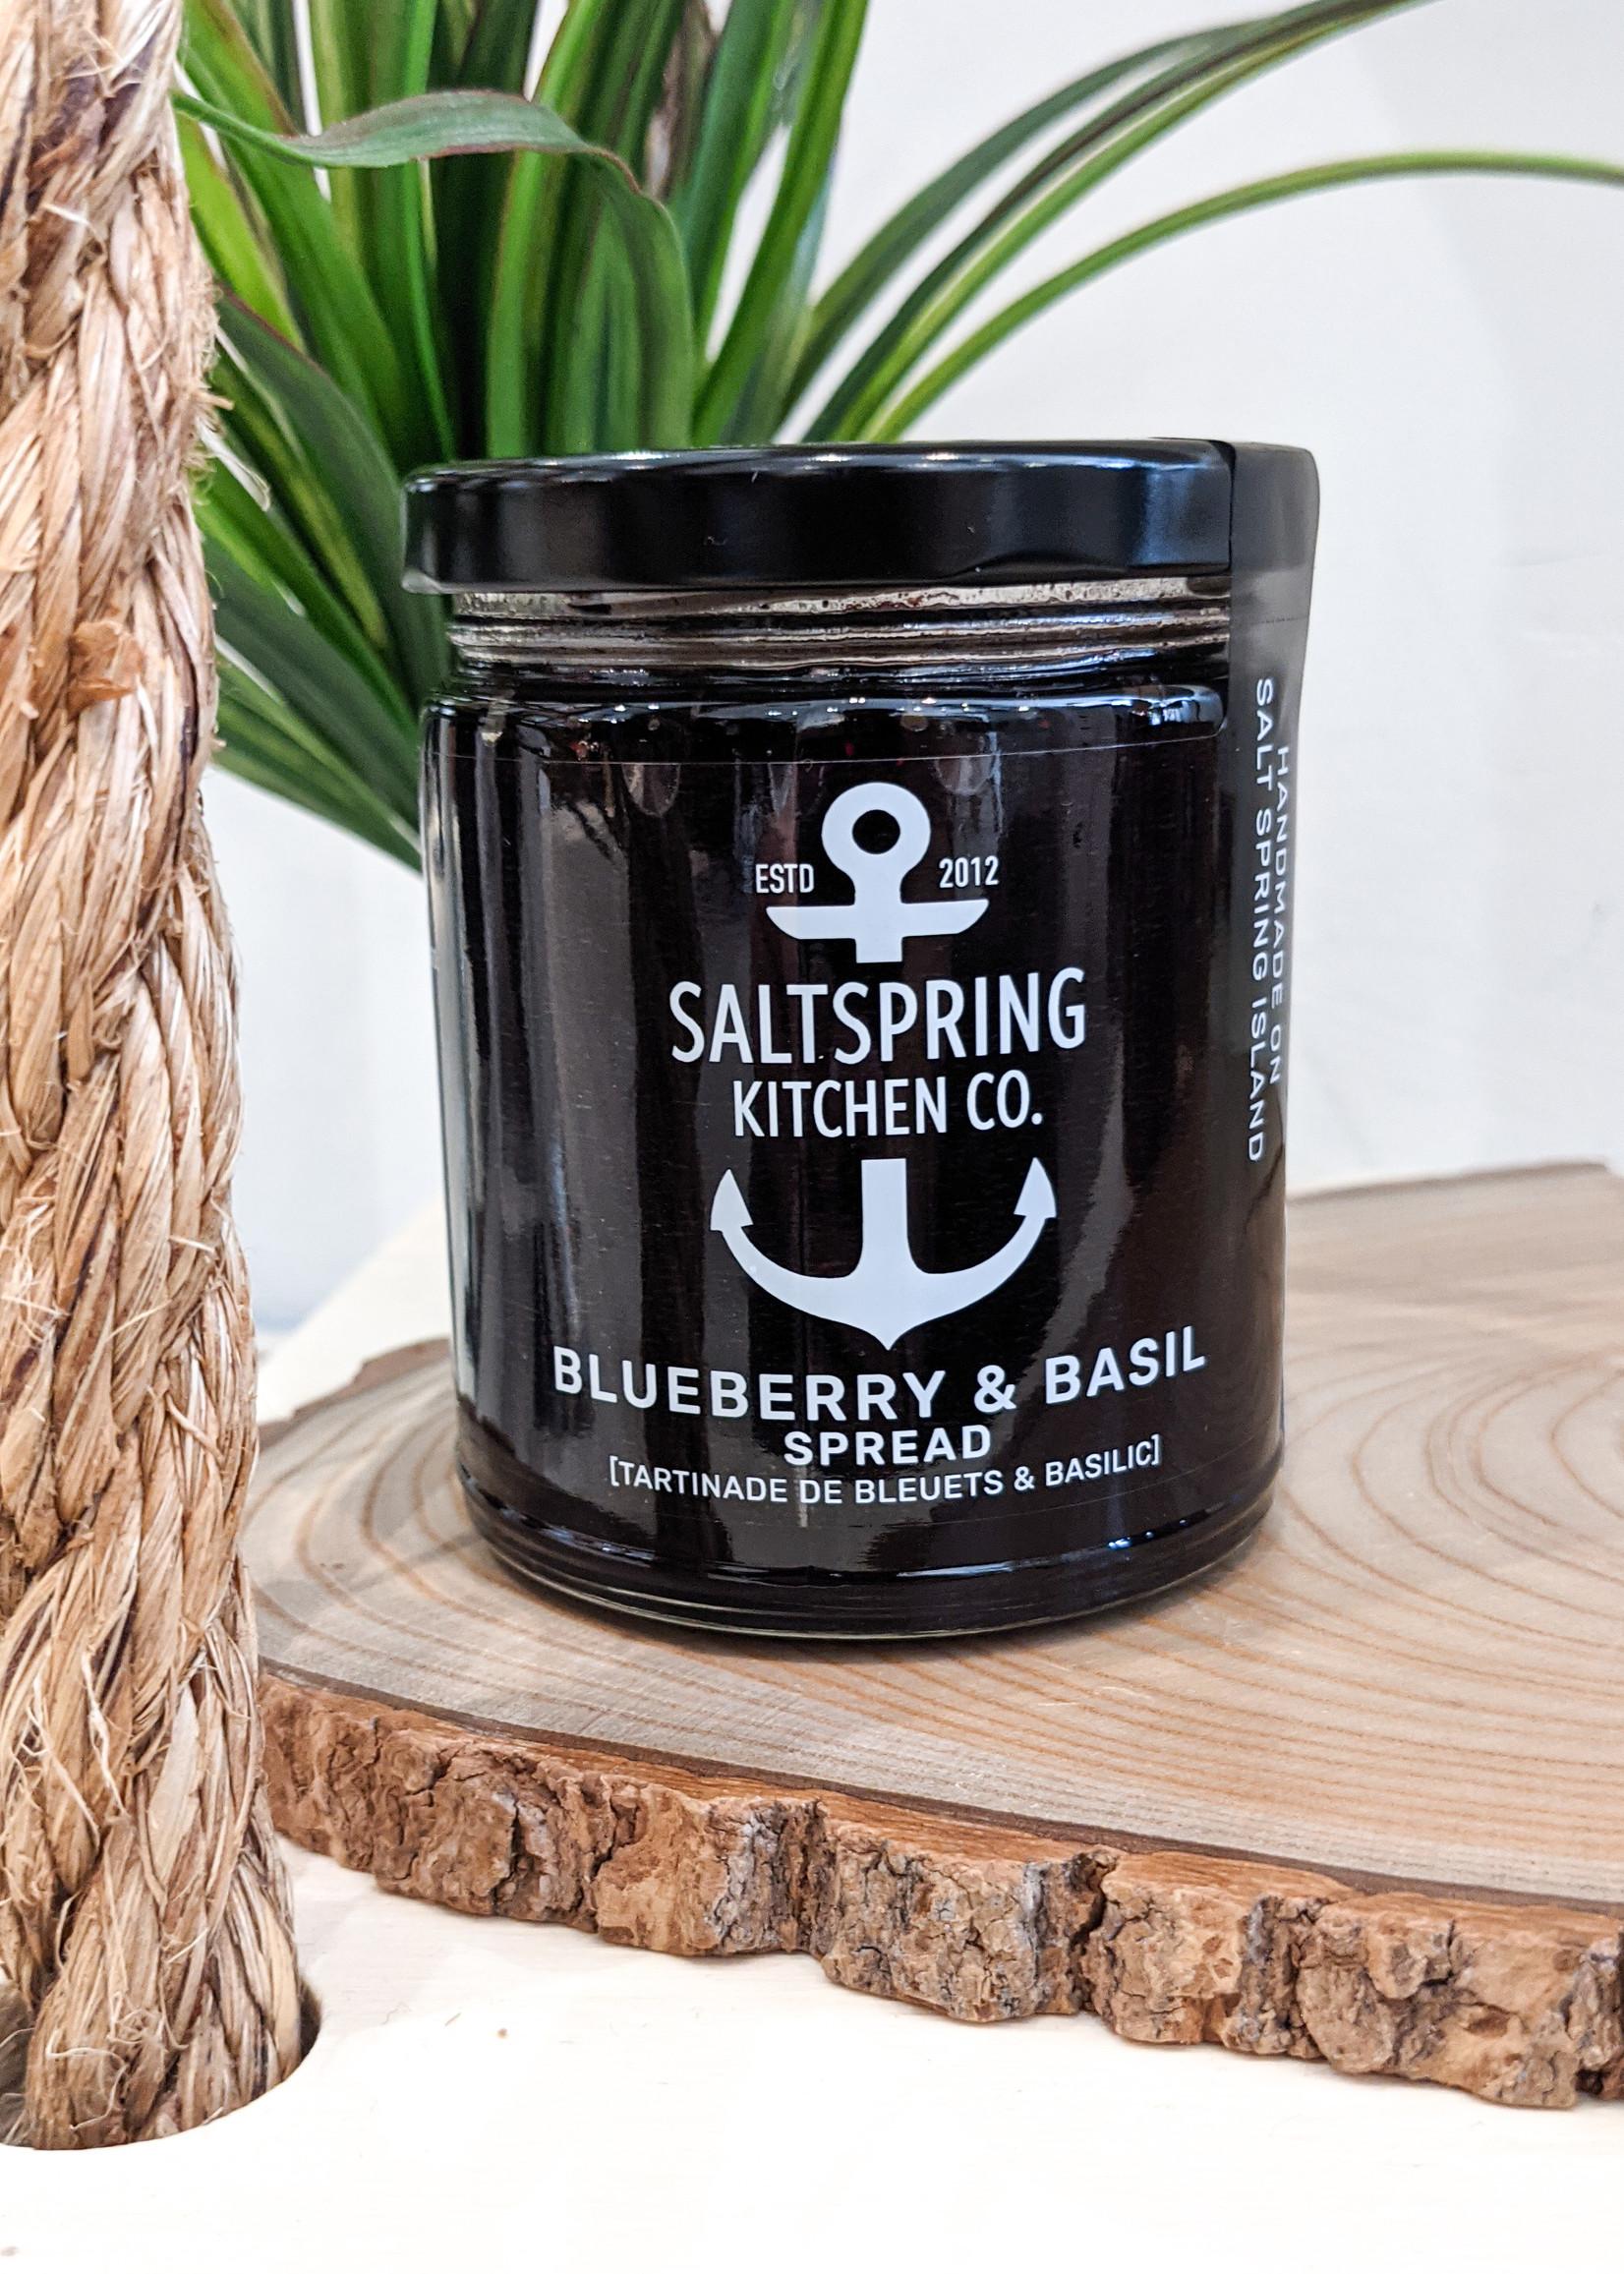 SaltSpring Kitchen Co. - Blueberry Basil Preserve